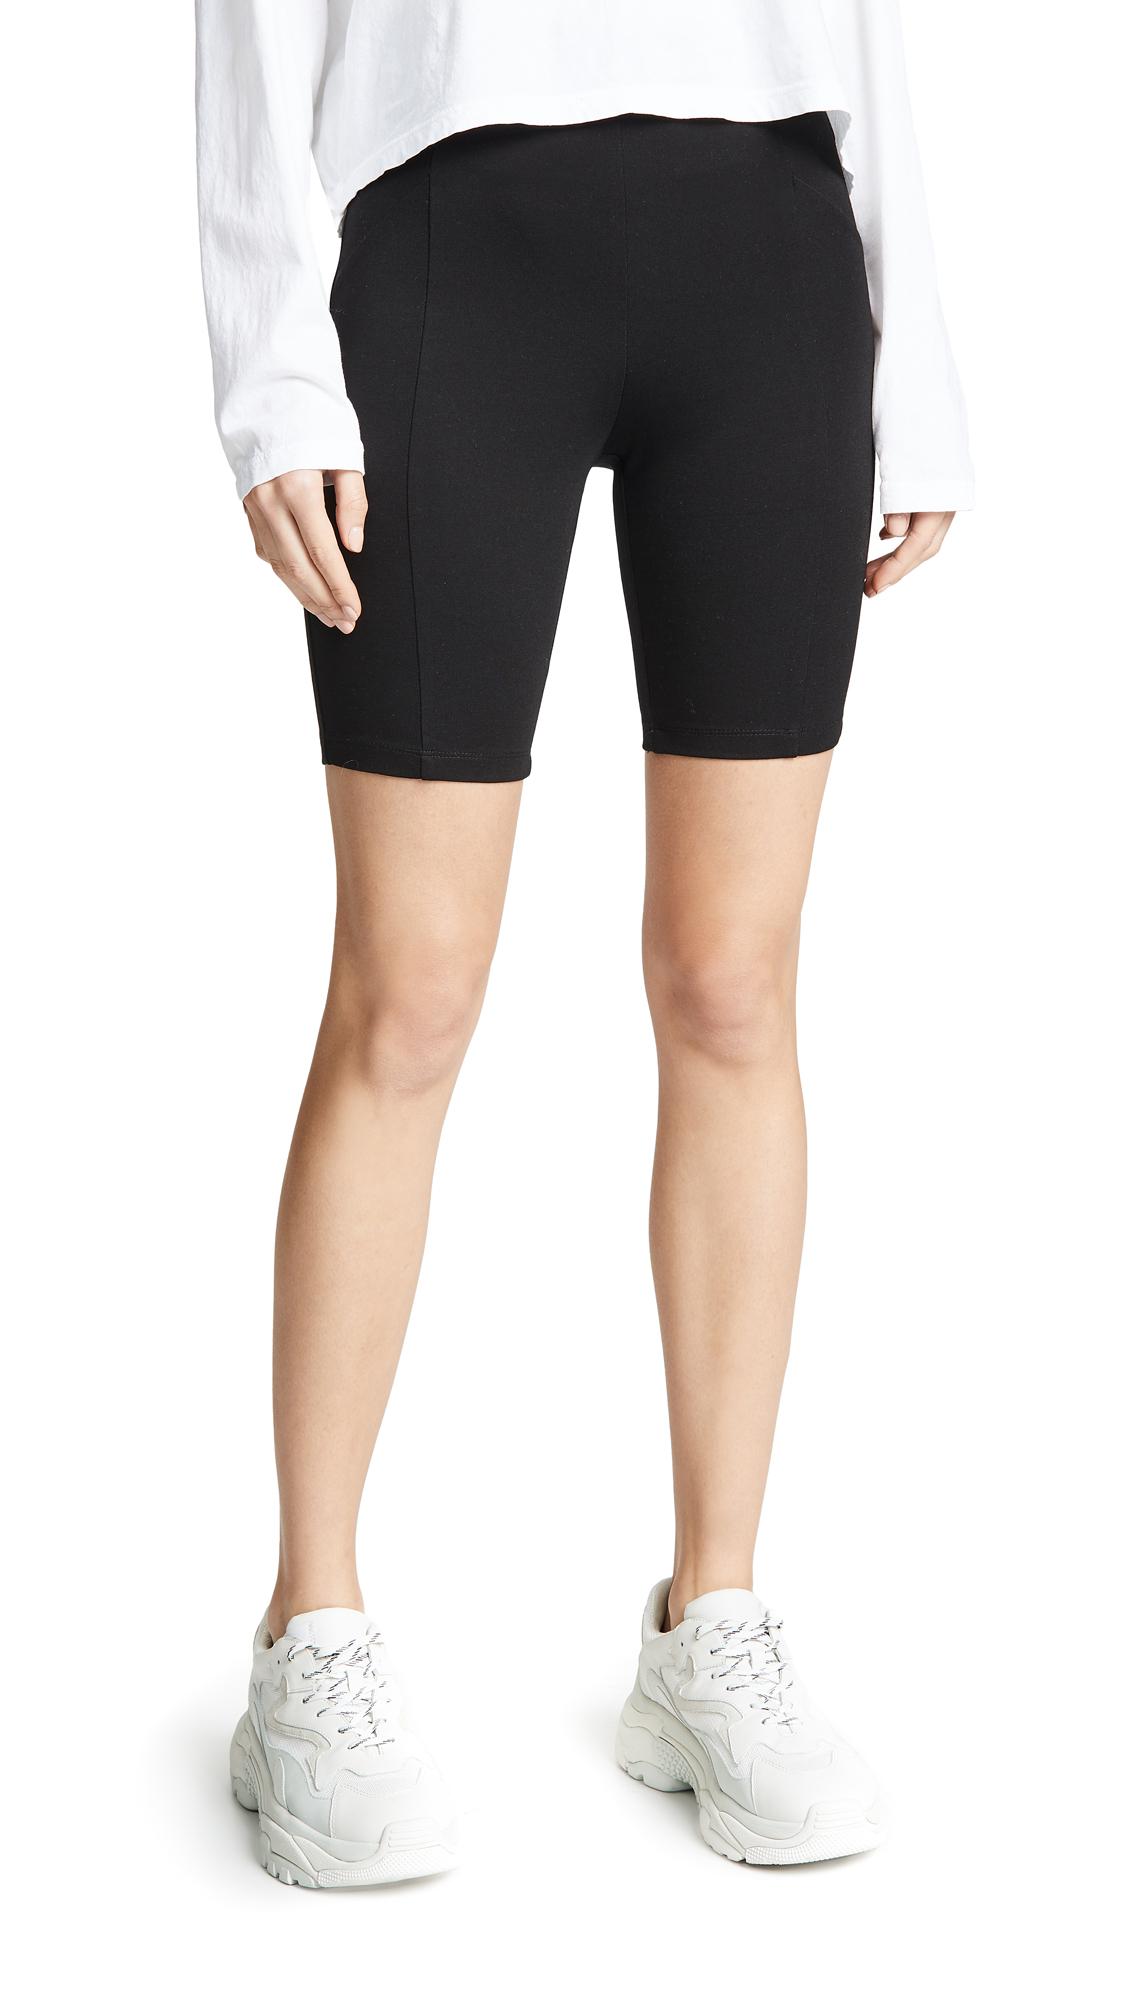 RE:NAMED Re: Named Feline Biker Shorts in Black